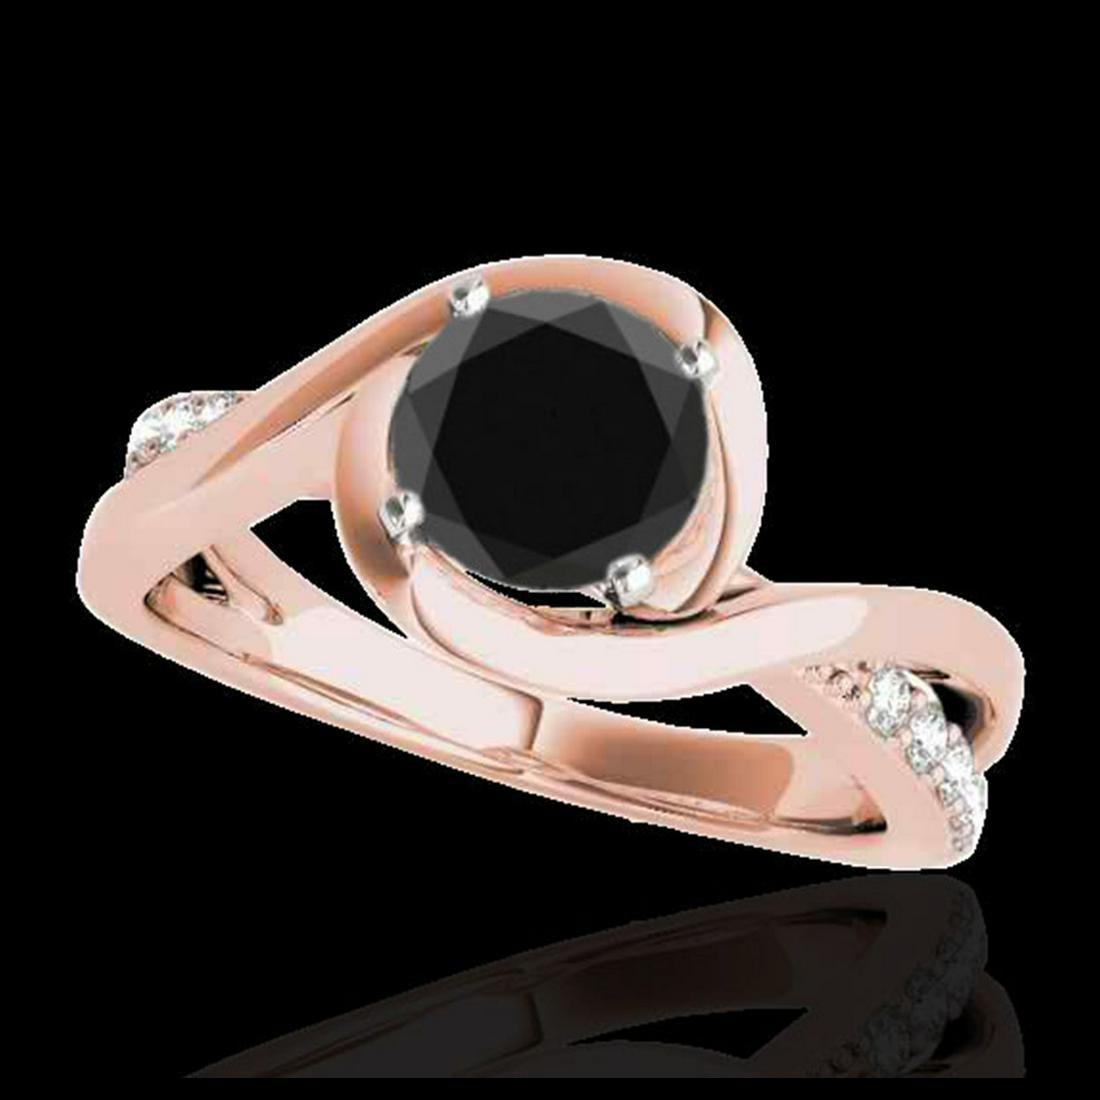 1.15 ctw VS Black Diamond Solitaire Ring 10K Rose Gold